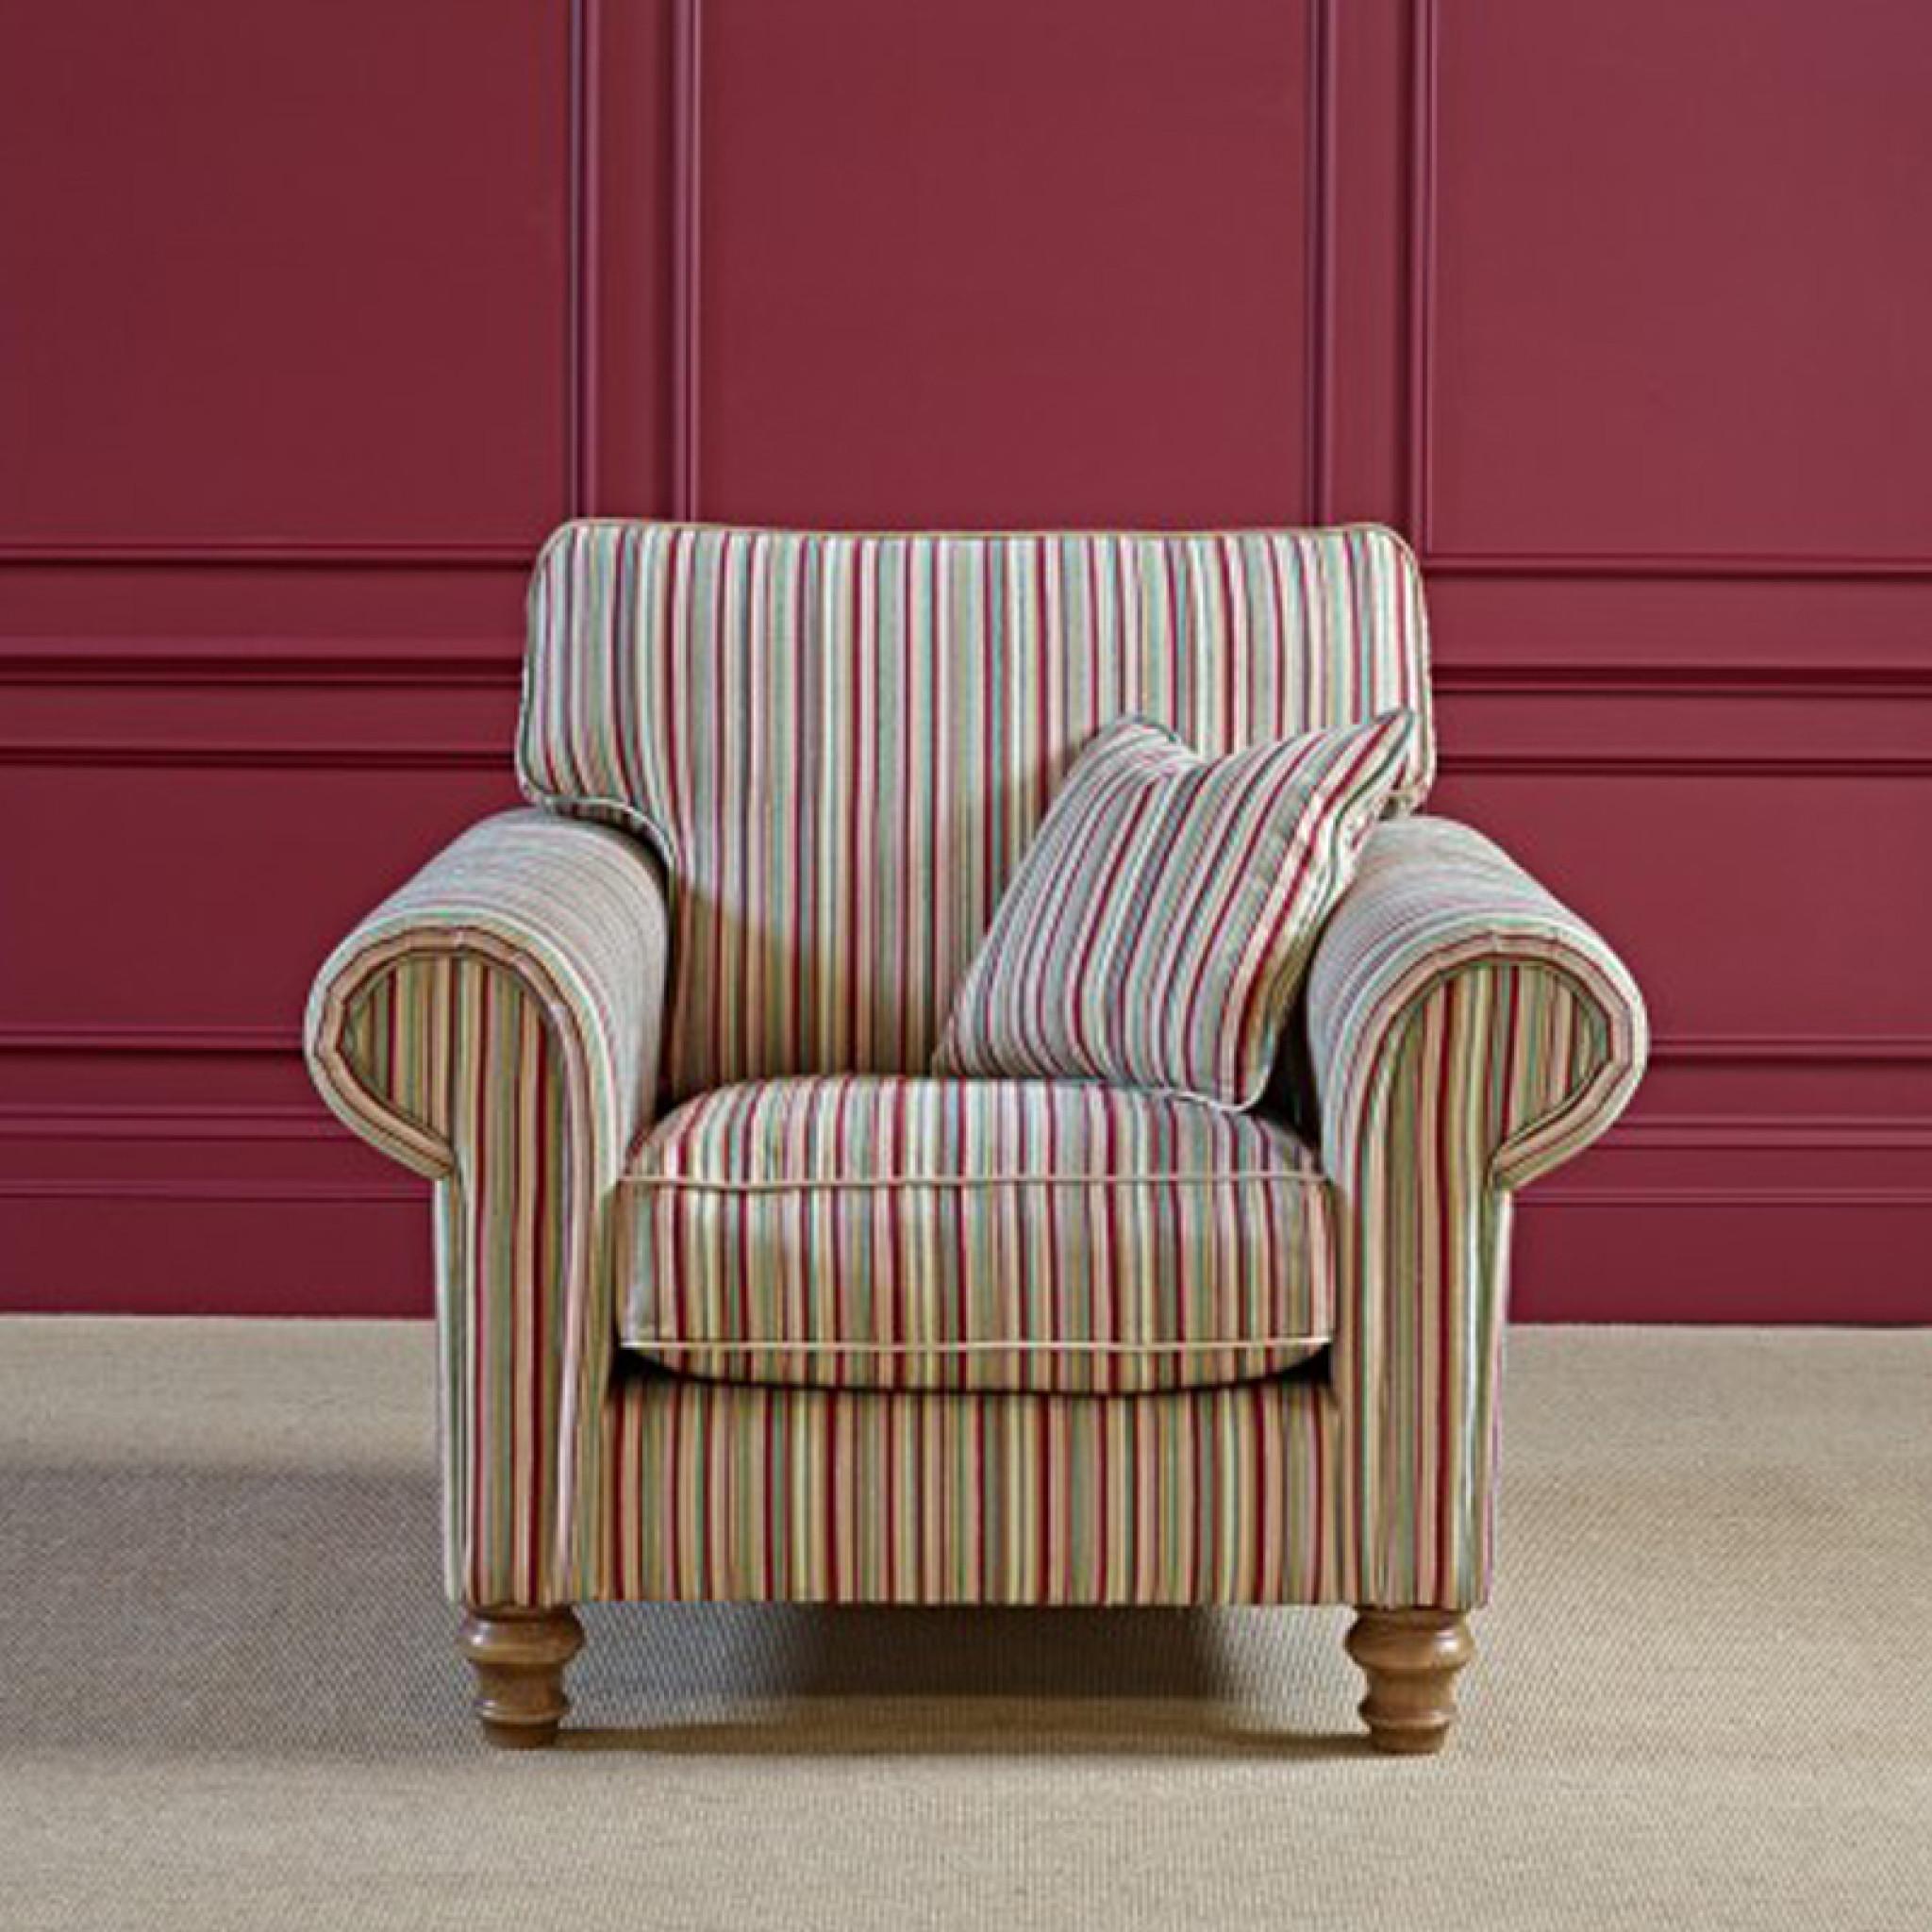 Awe Inspiring Lav140 The Lavenham Chair Wood Bros Old Charm Furniture Customarchery Wood Chair Design Ideas Customarcherynet